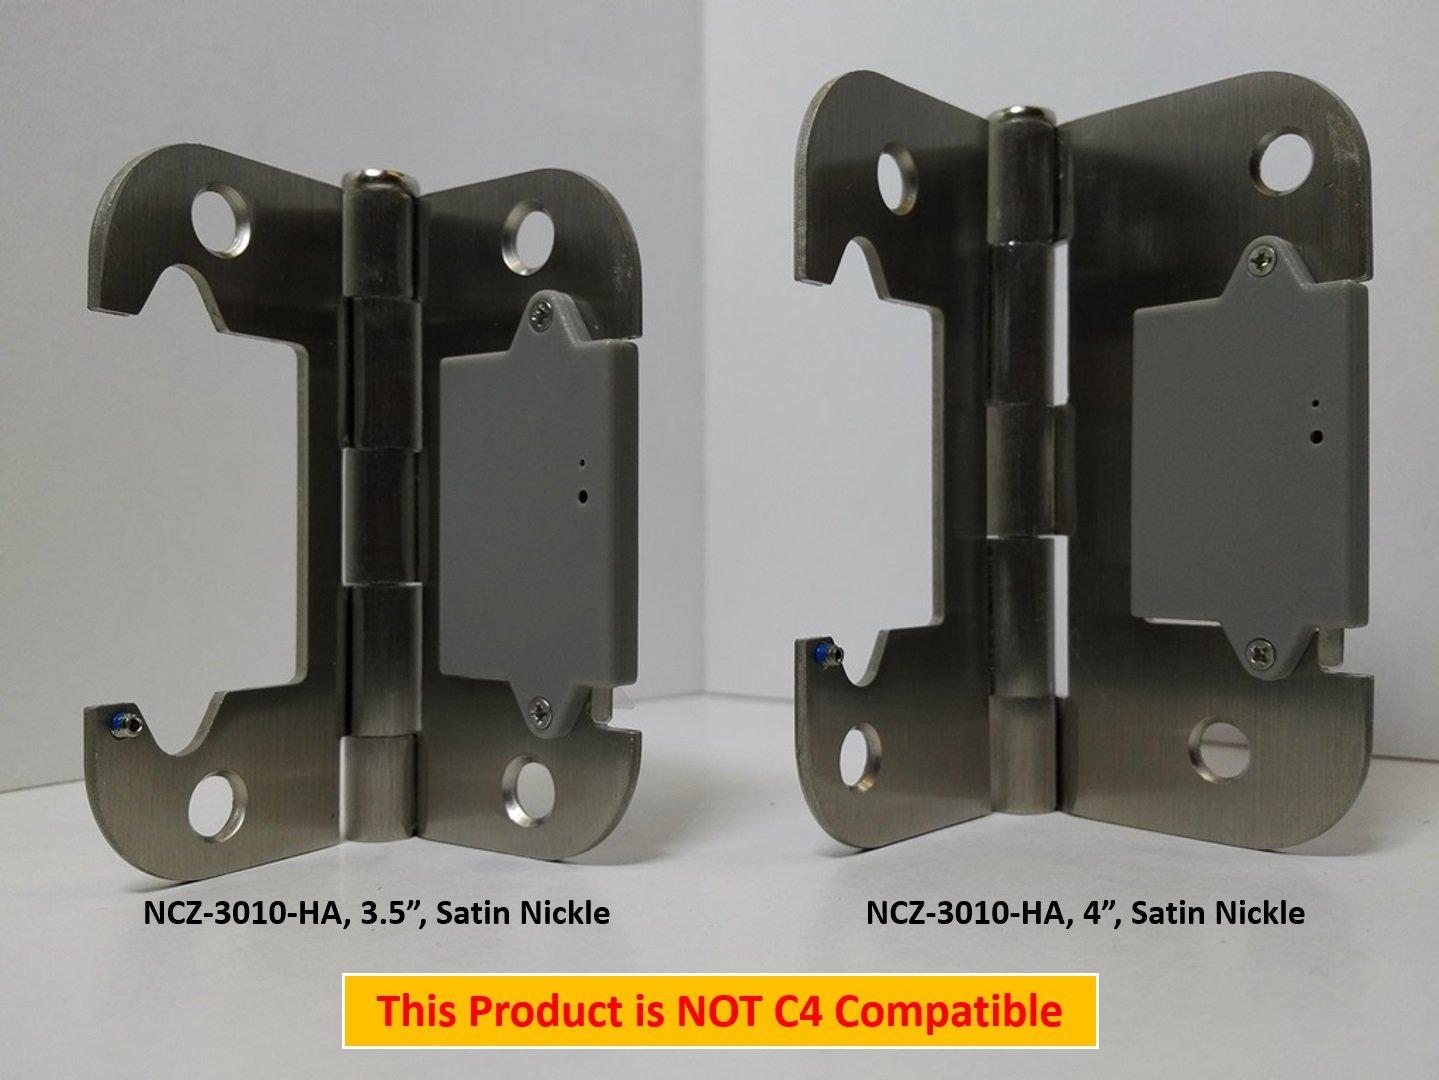 Nyce Ncz 3010 2 Ha Door Hinge Sensor 4 Satin Nickel Iris 3 Way Switch Wiring Finish Camera Photo